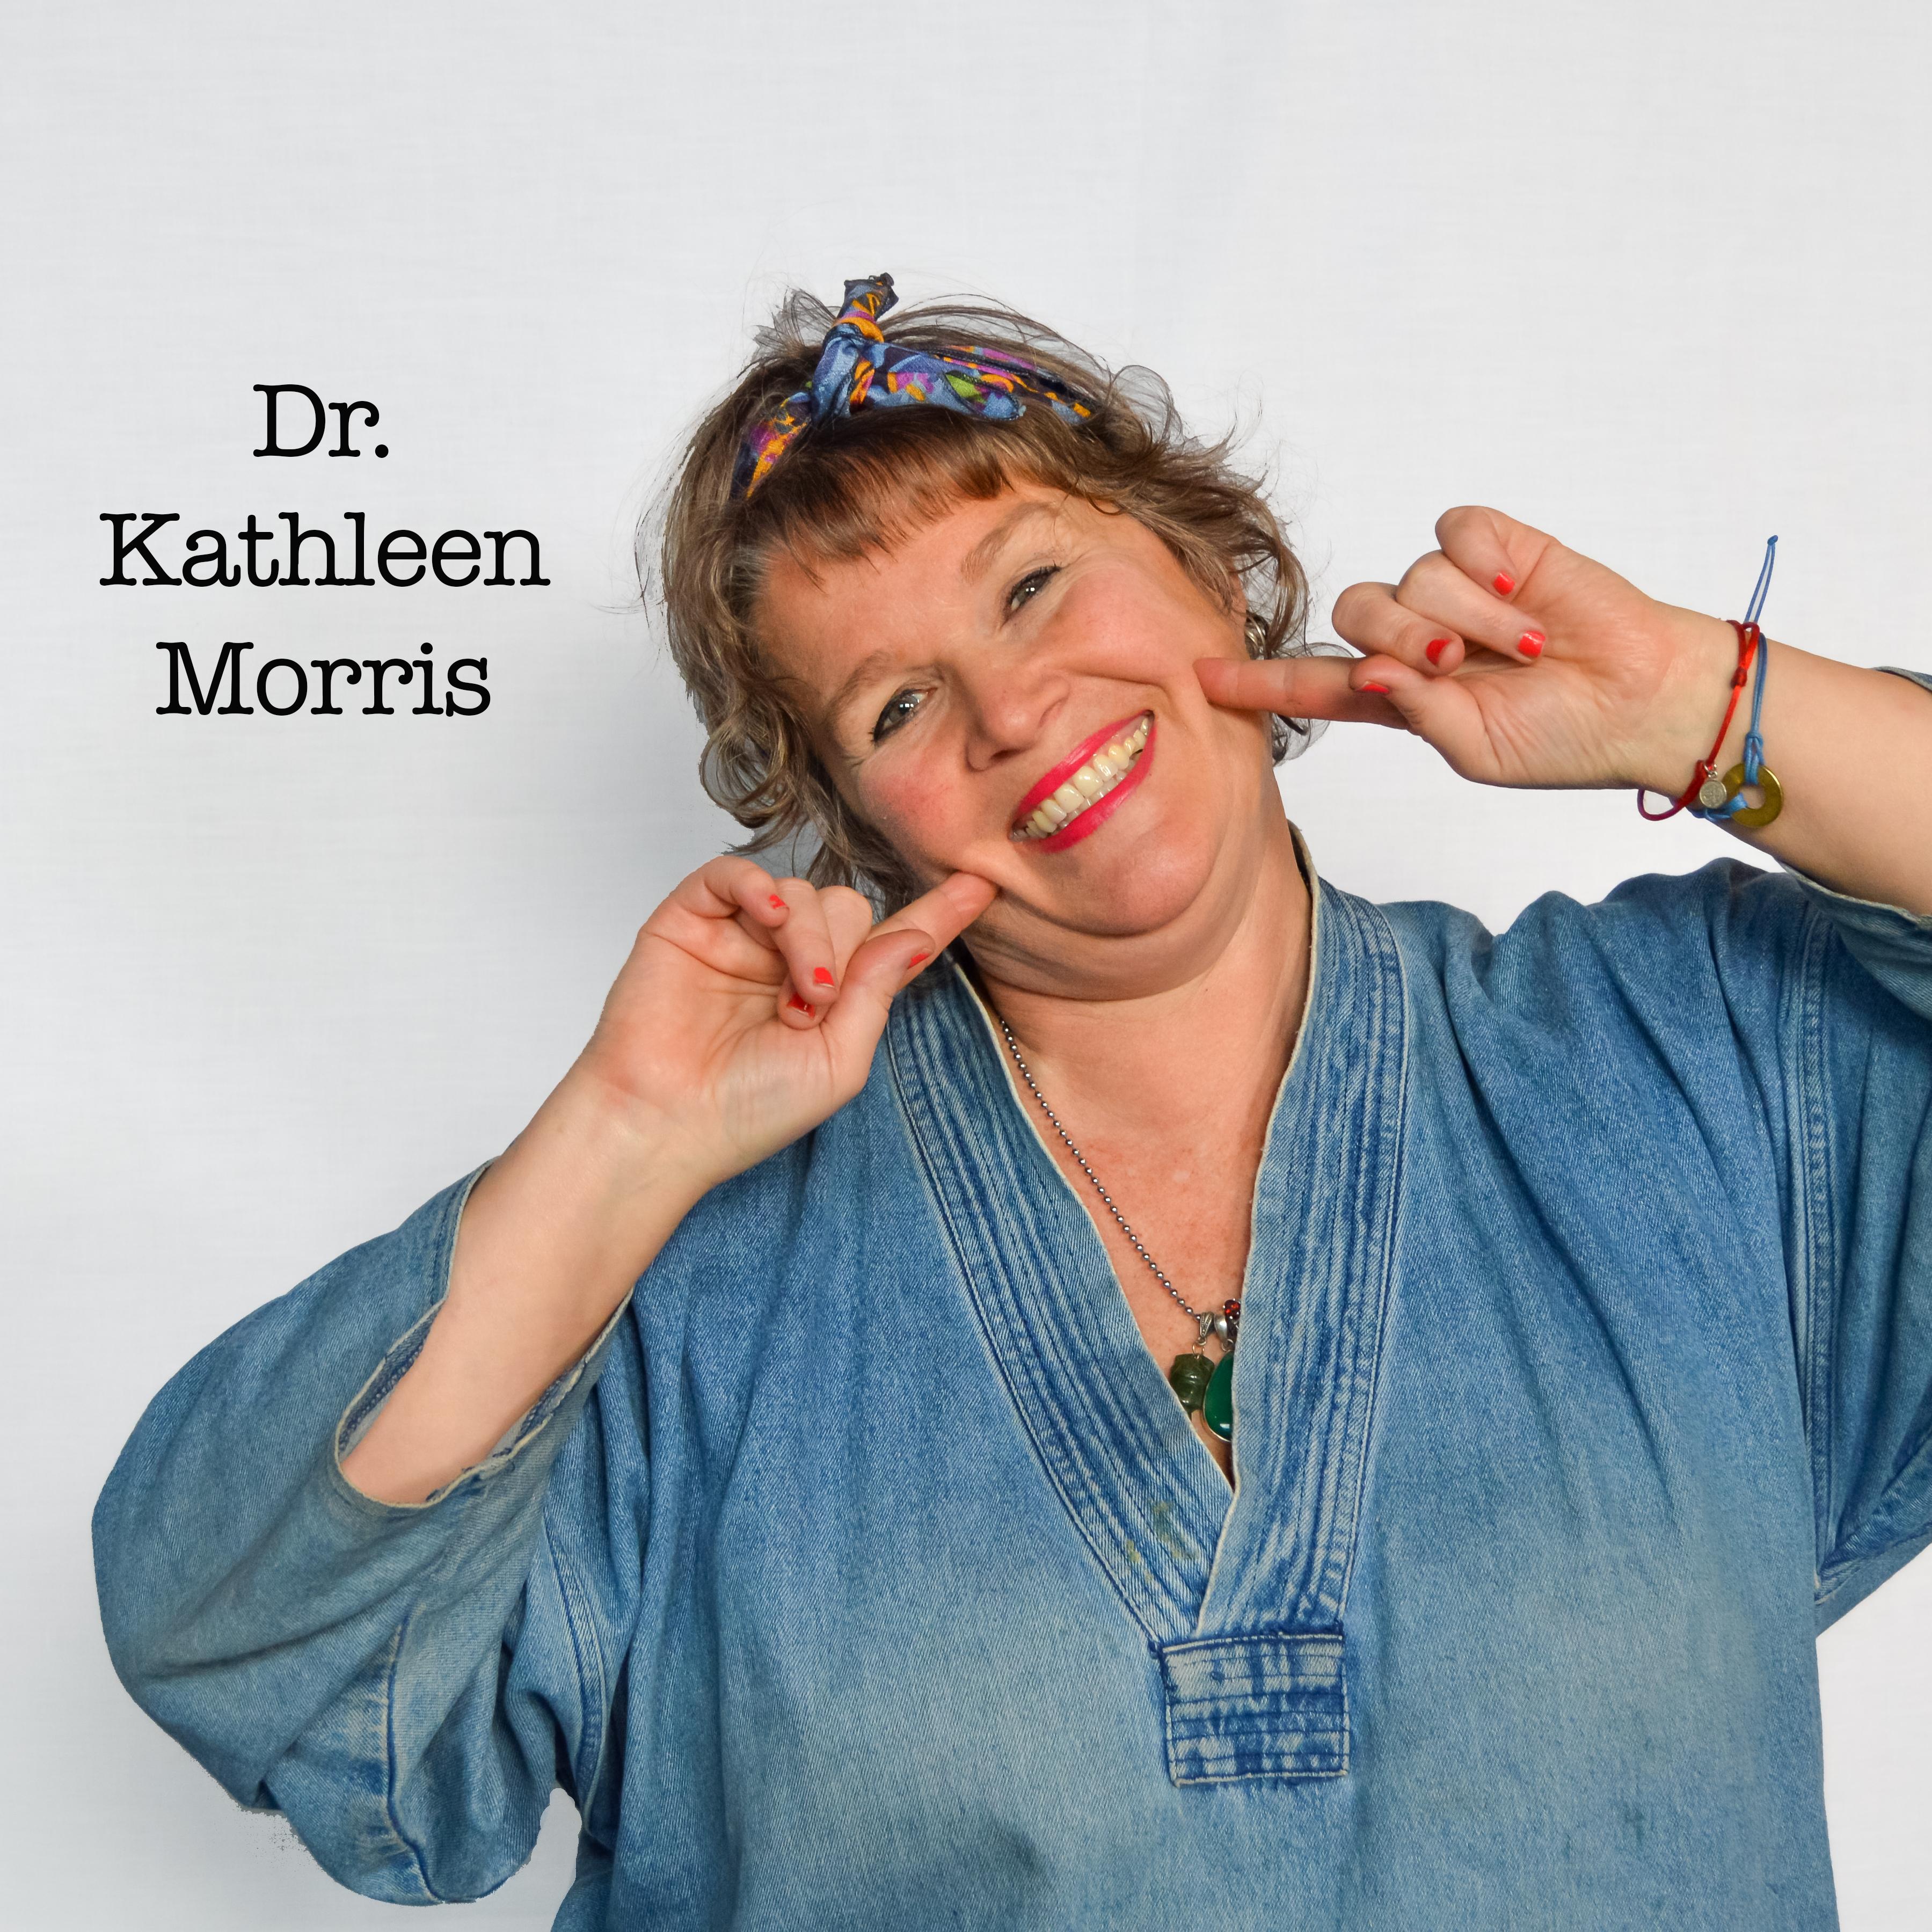 Dr. Kathleen Morris